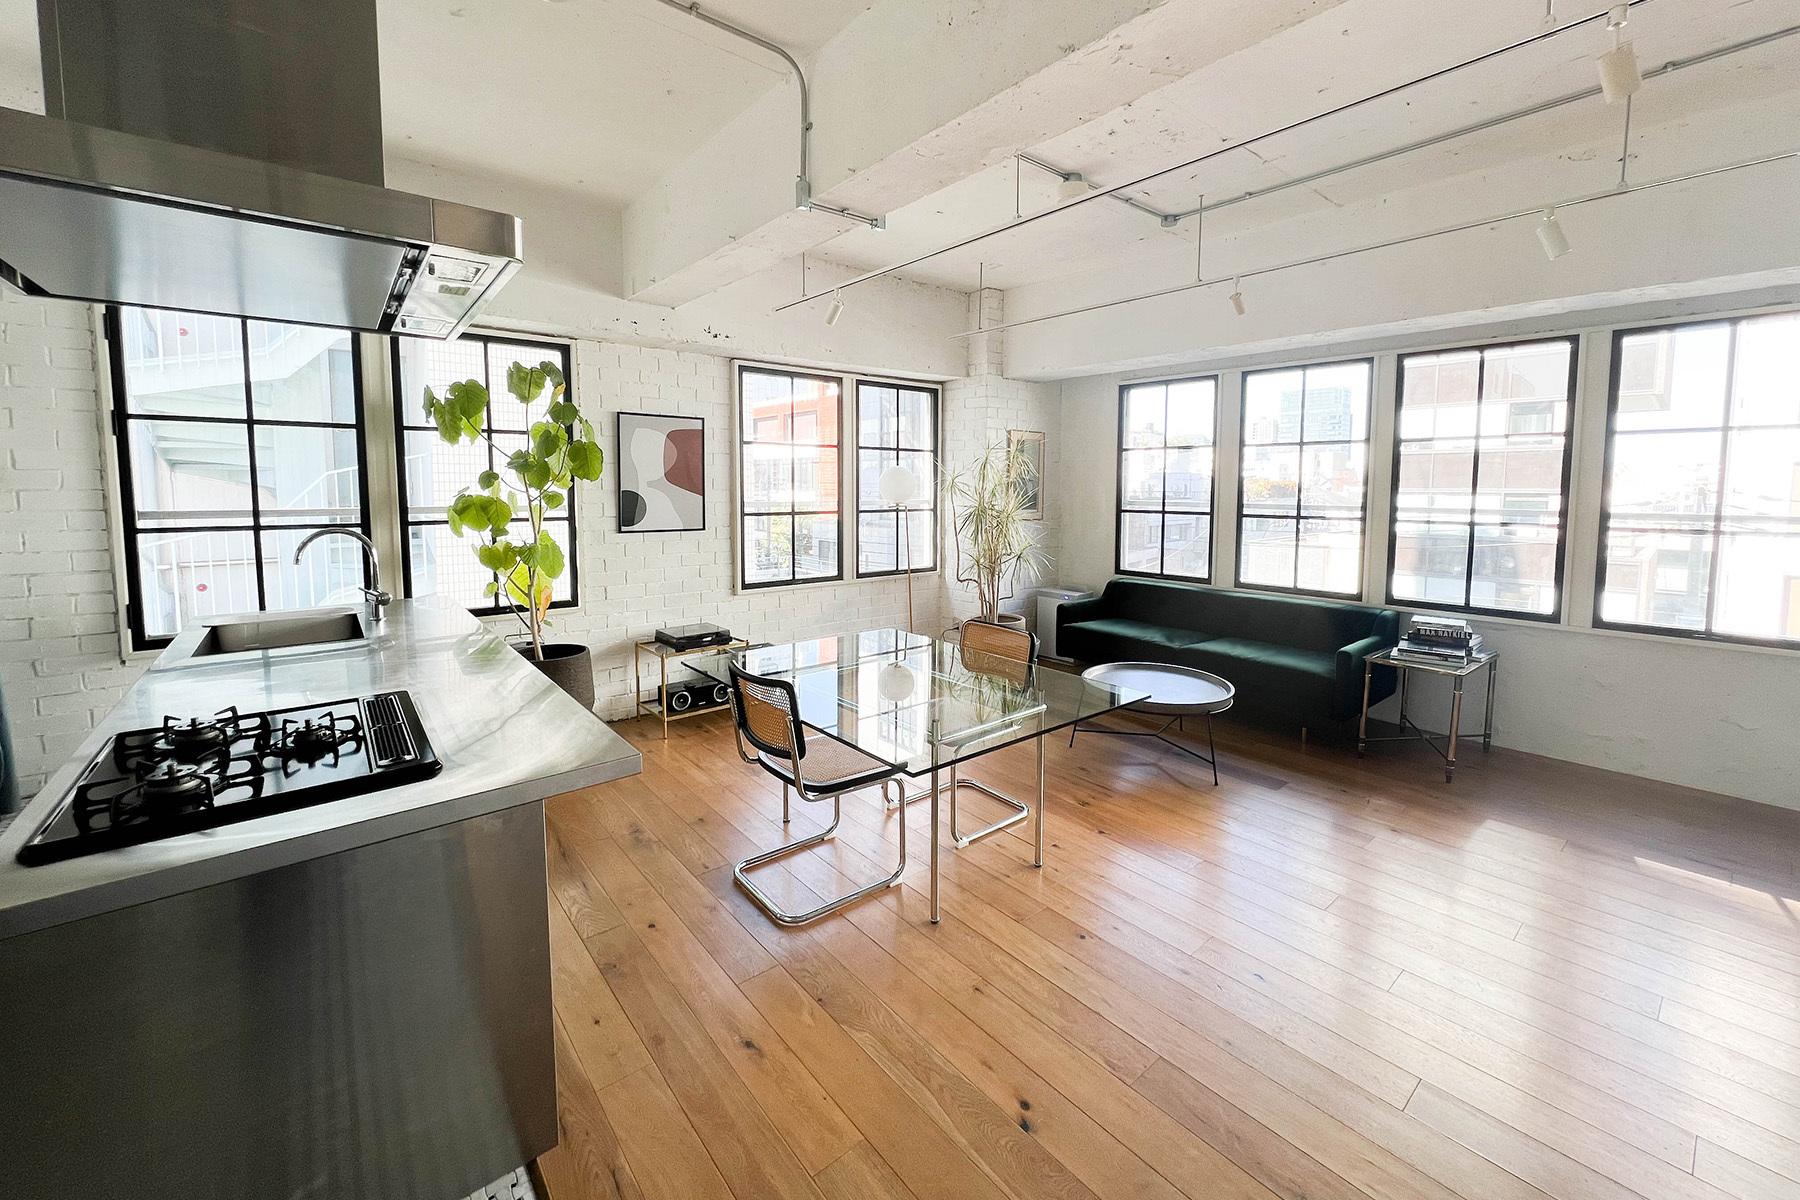 atelier rauque Cstudio (アトリエロークCスタジオ)キッチン側からリビング